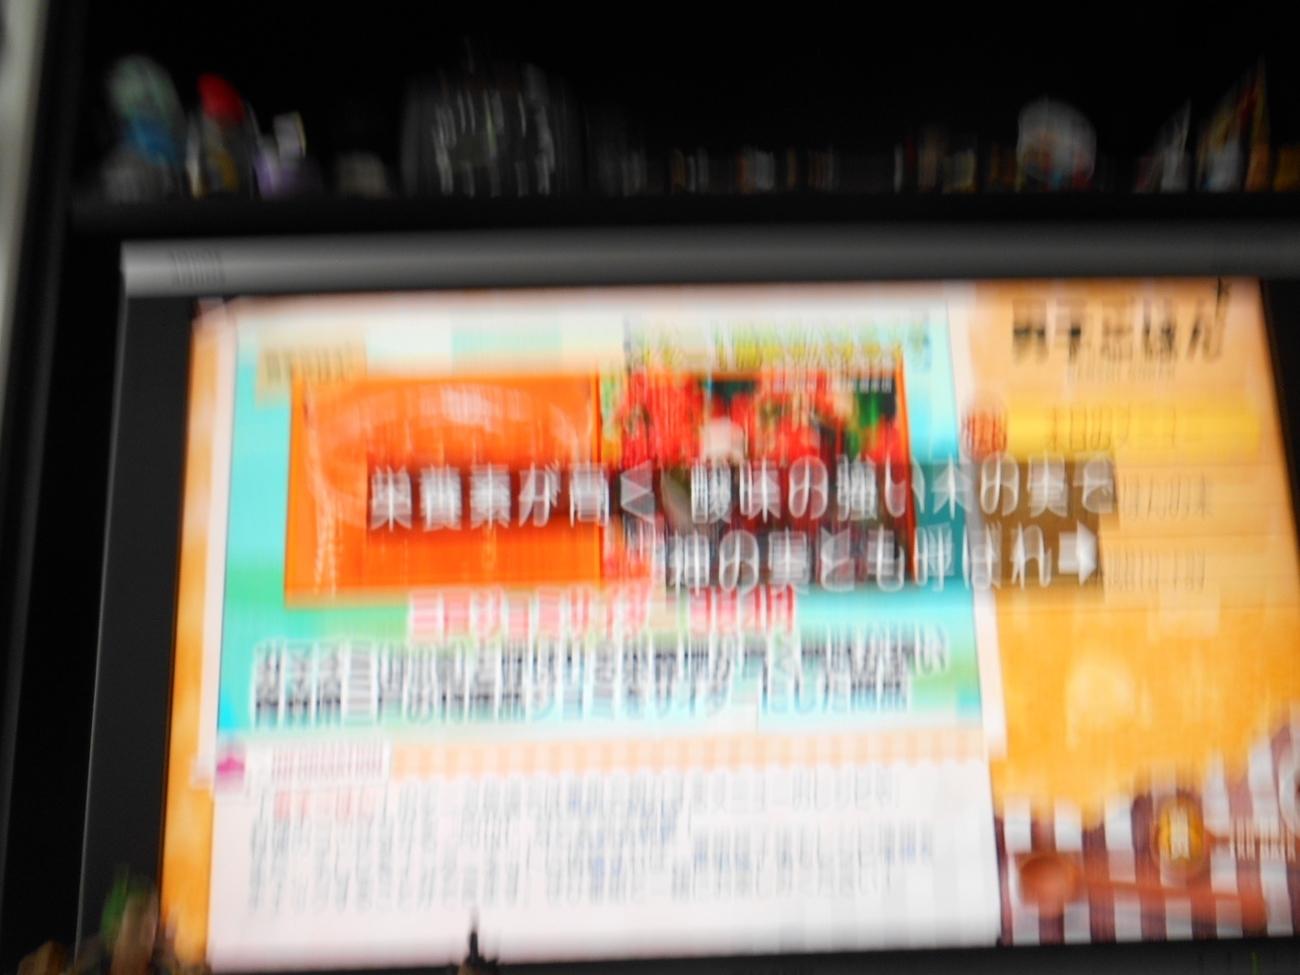 f:id:Df-kyounoyume-Sneonstiamlegnita:20190721114240j:plain